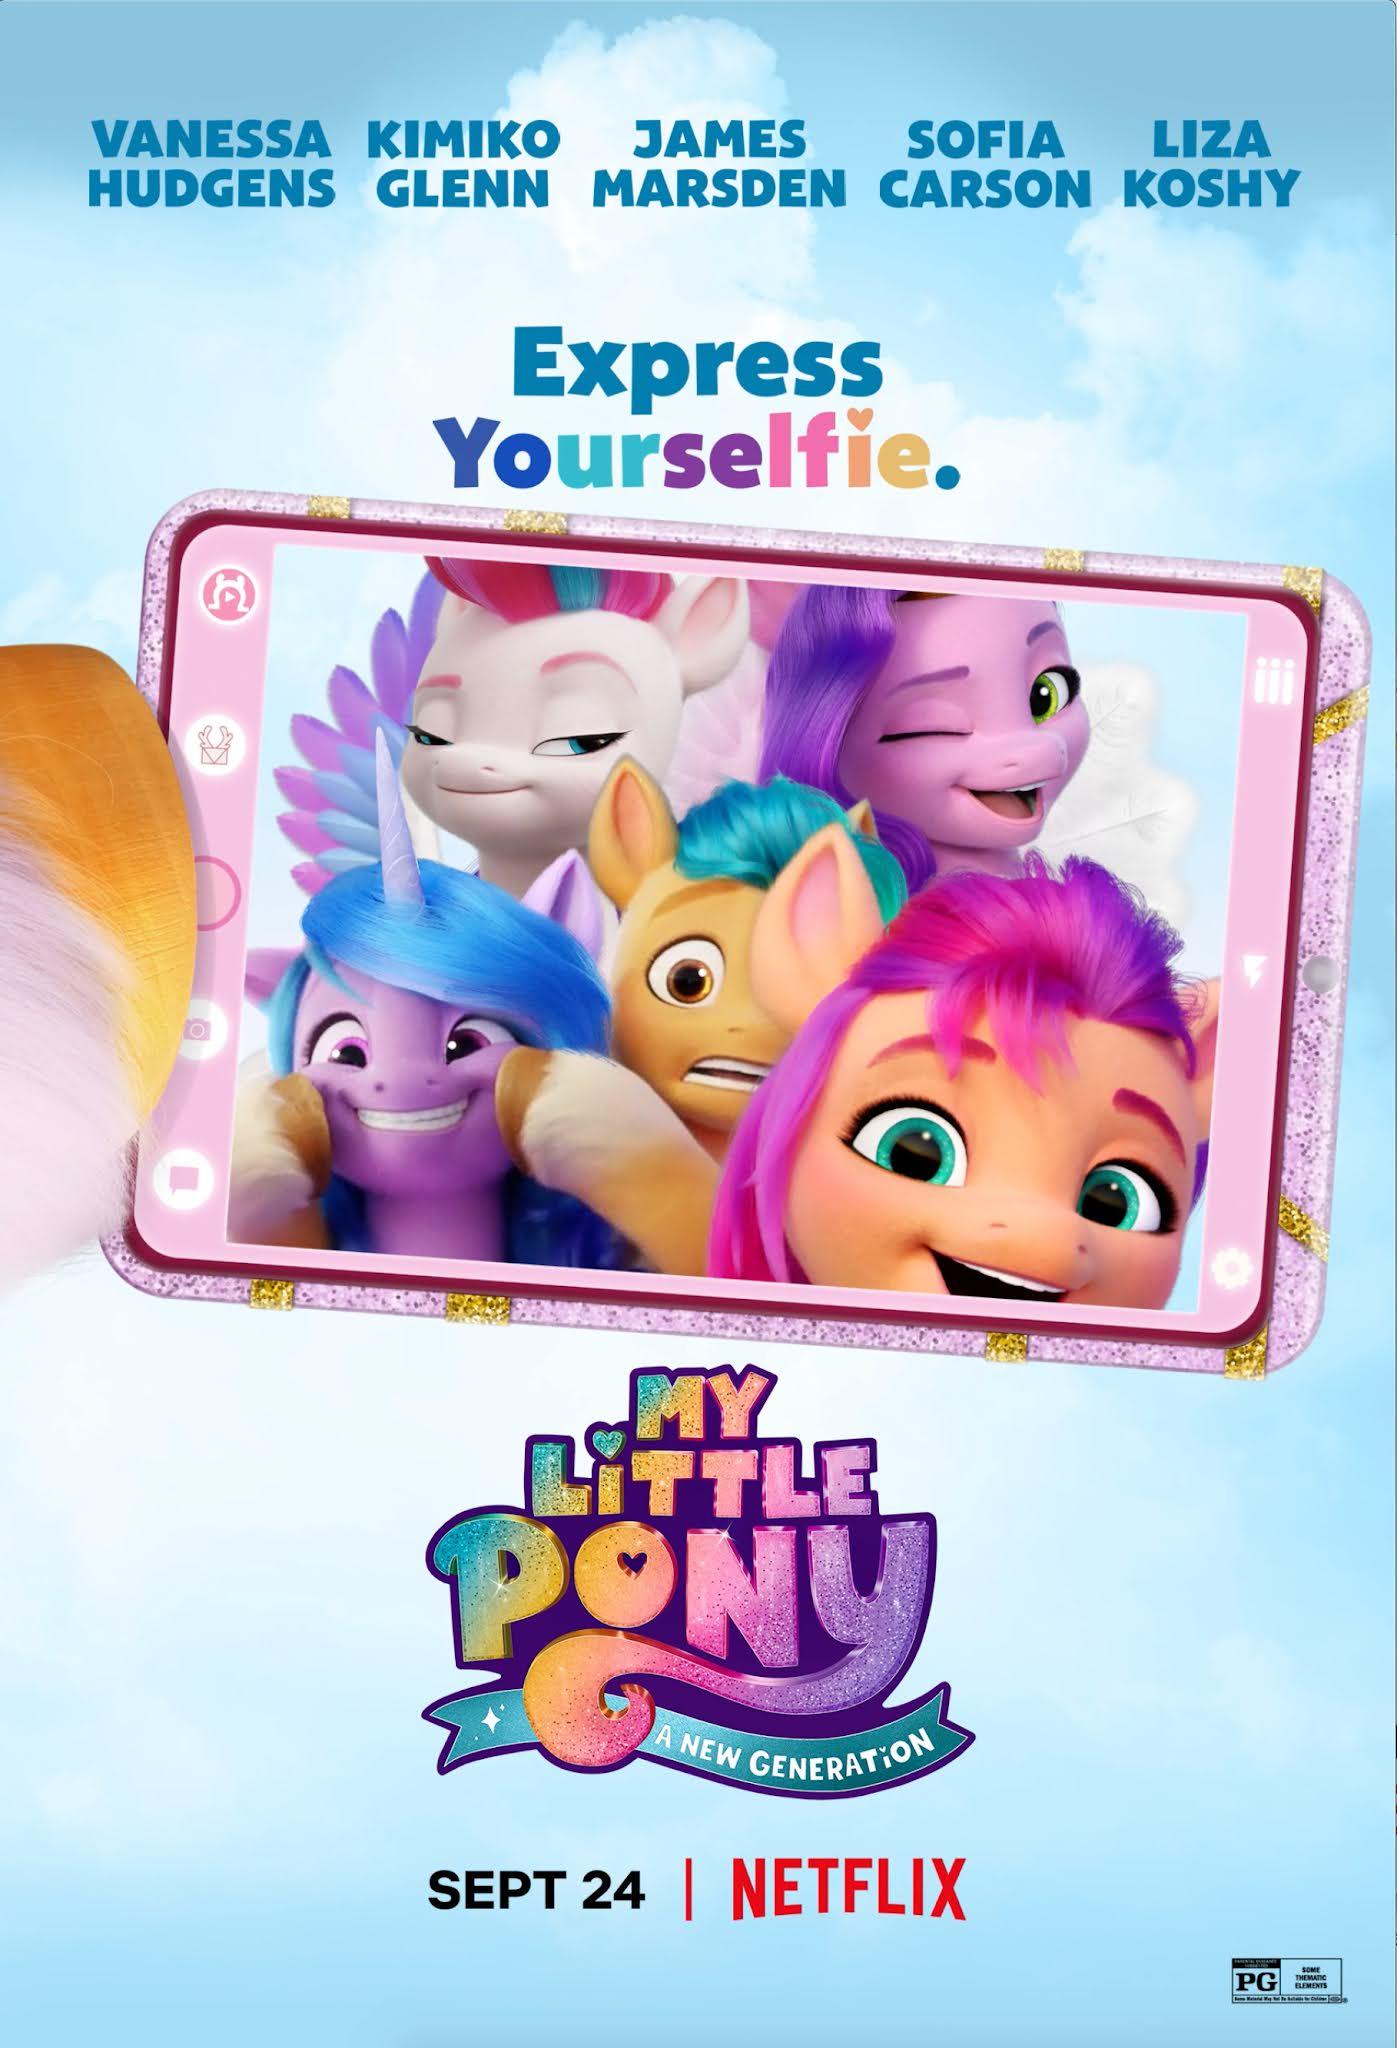 Pony Bé Nhỏ: Thế Hệ Mới - My Little Pony A New Generation